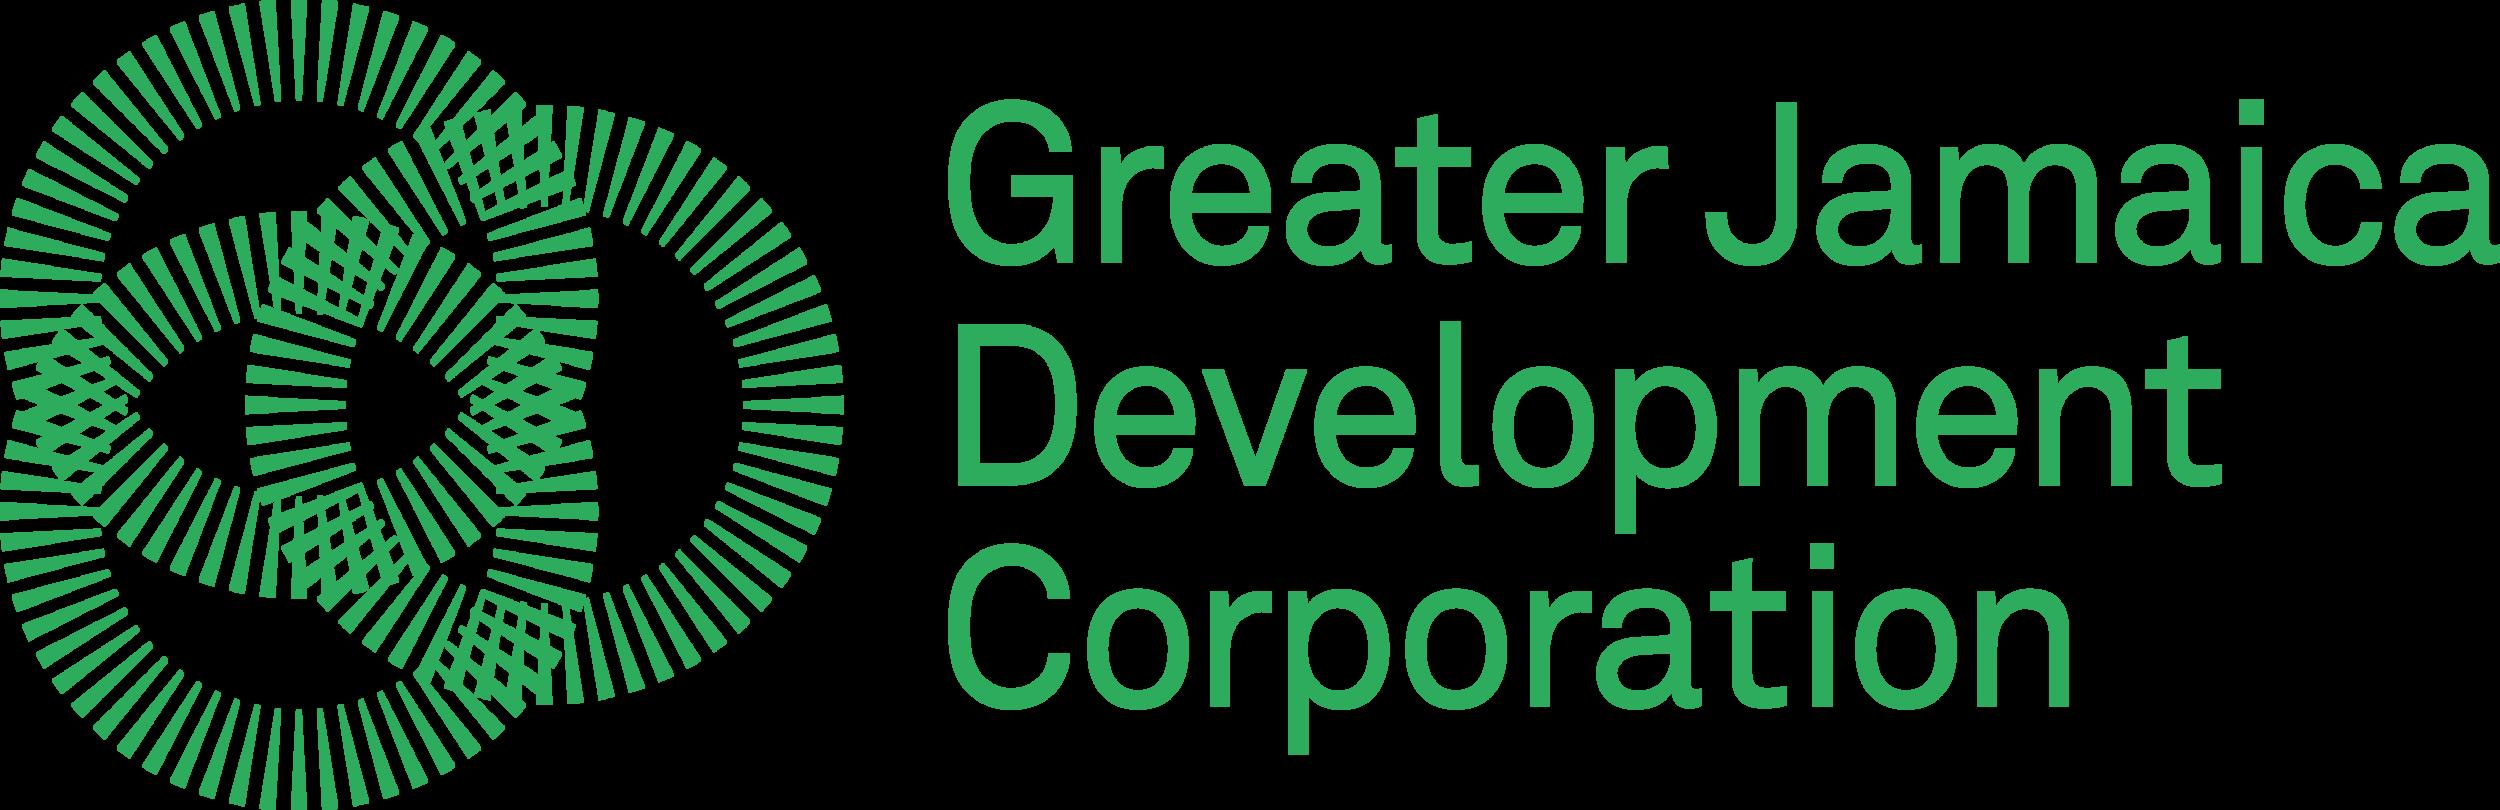 GJDC_1_Green.png